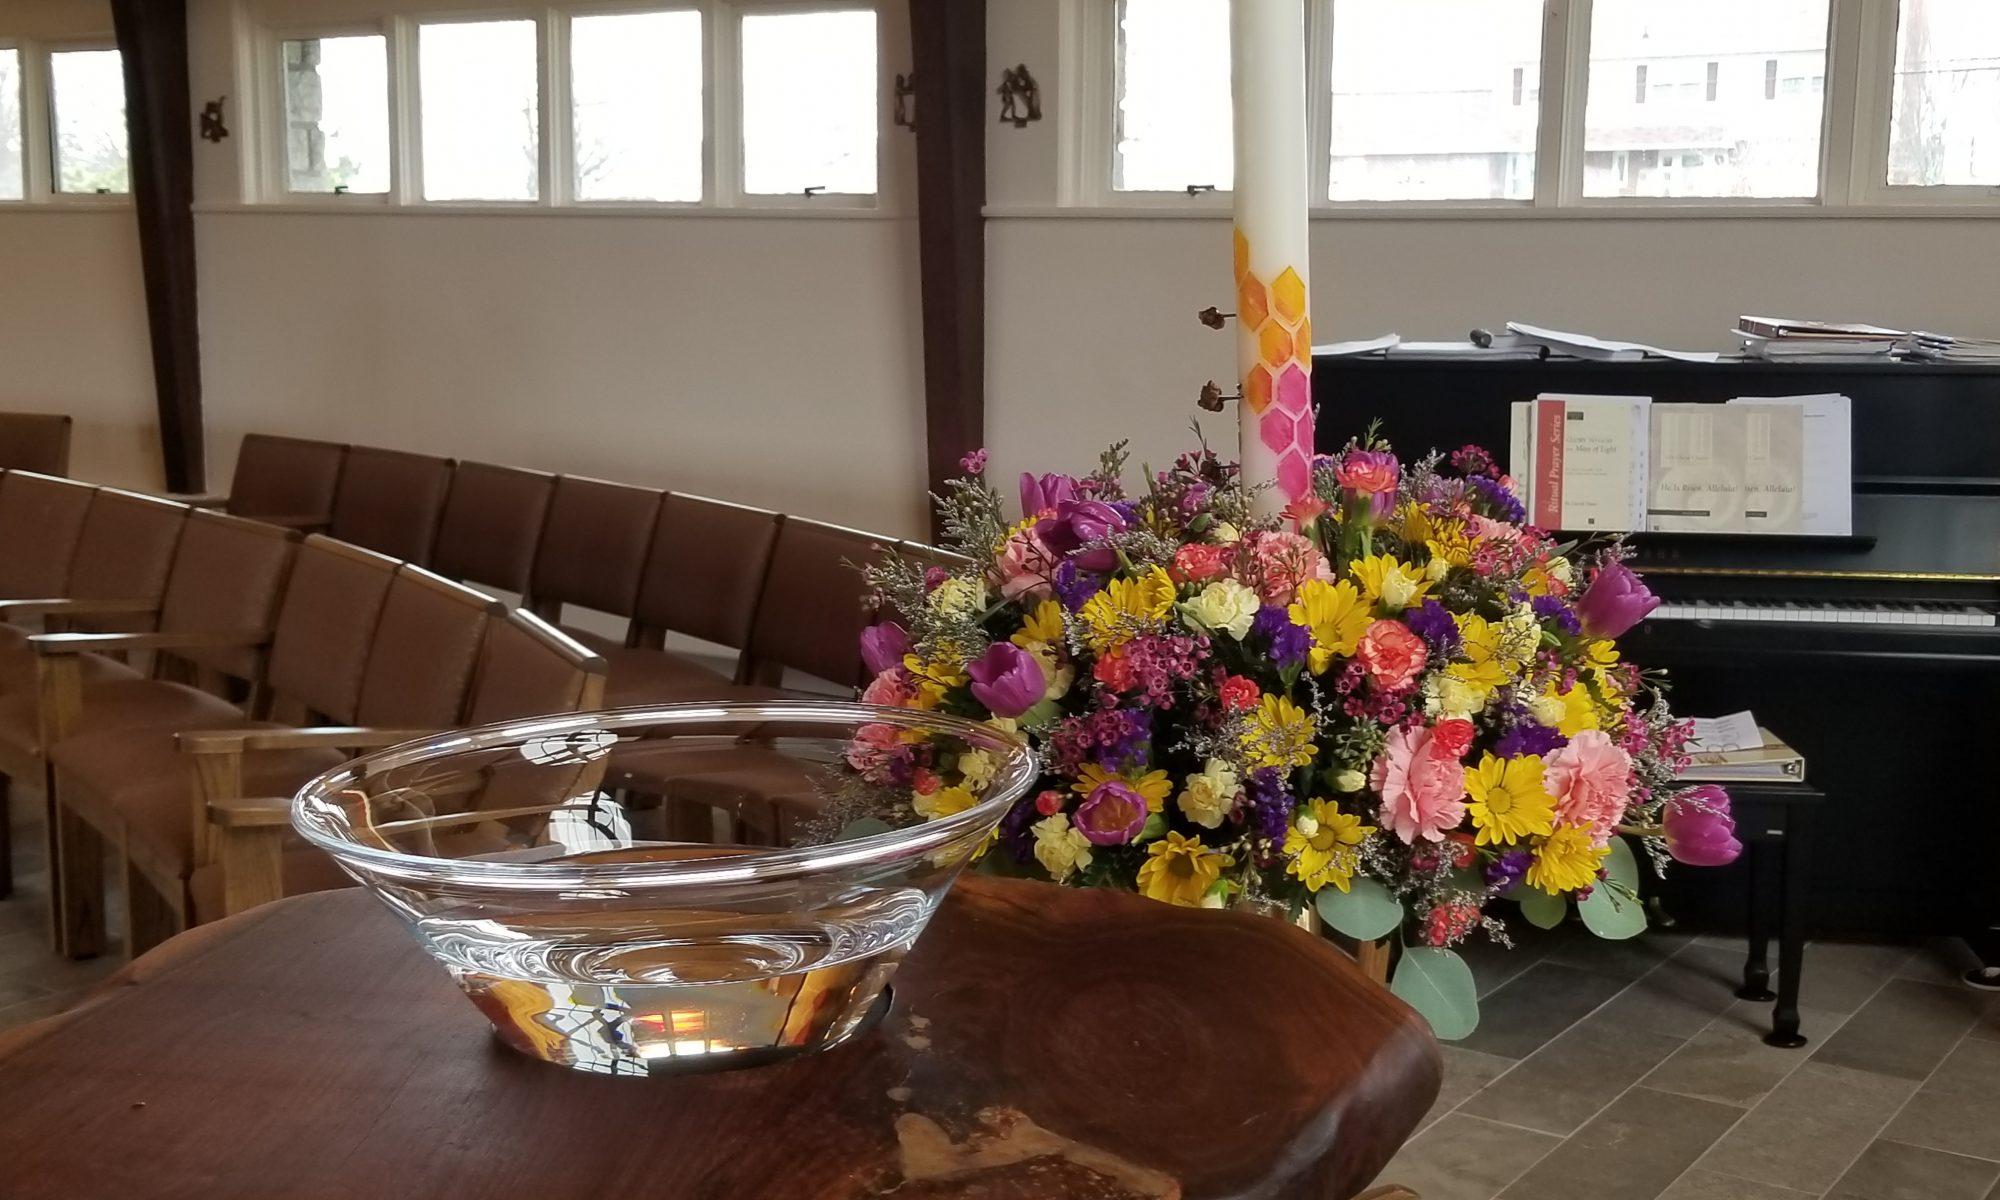 St. Christopher's Episcopal Church   Easter Season - 10:30 AM